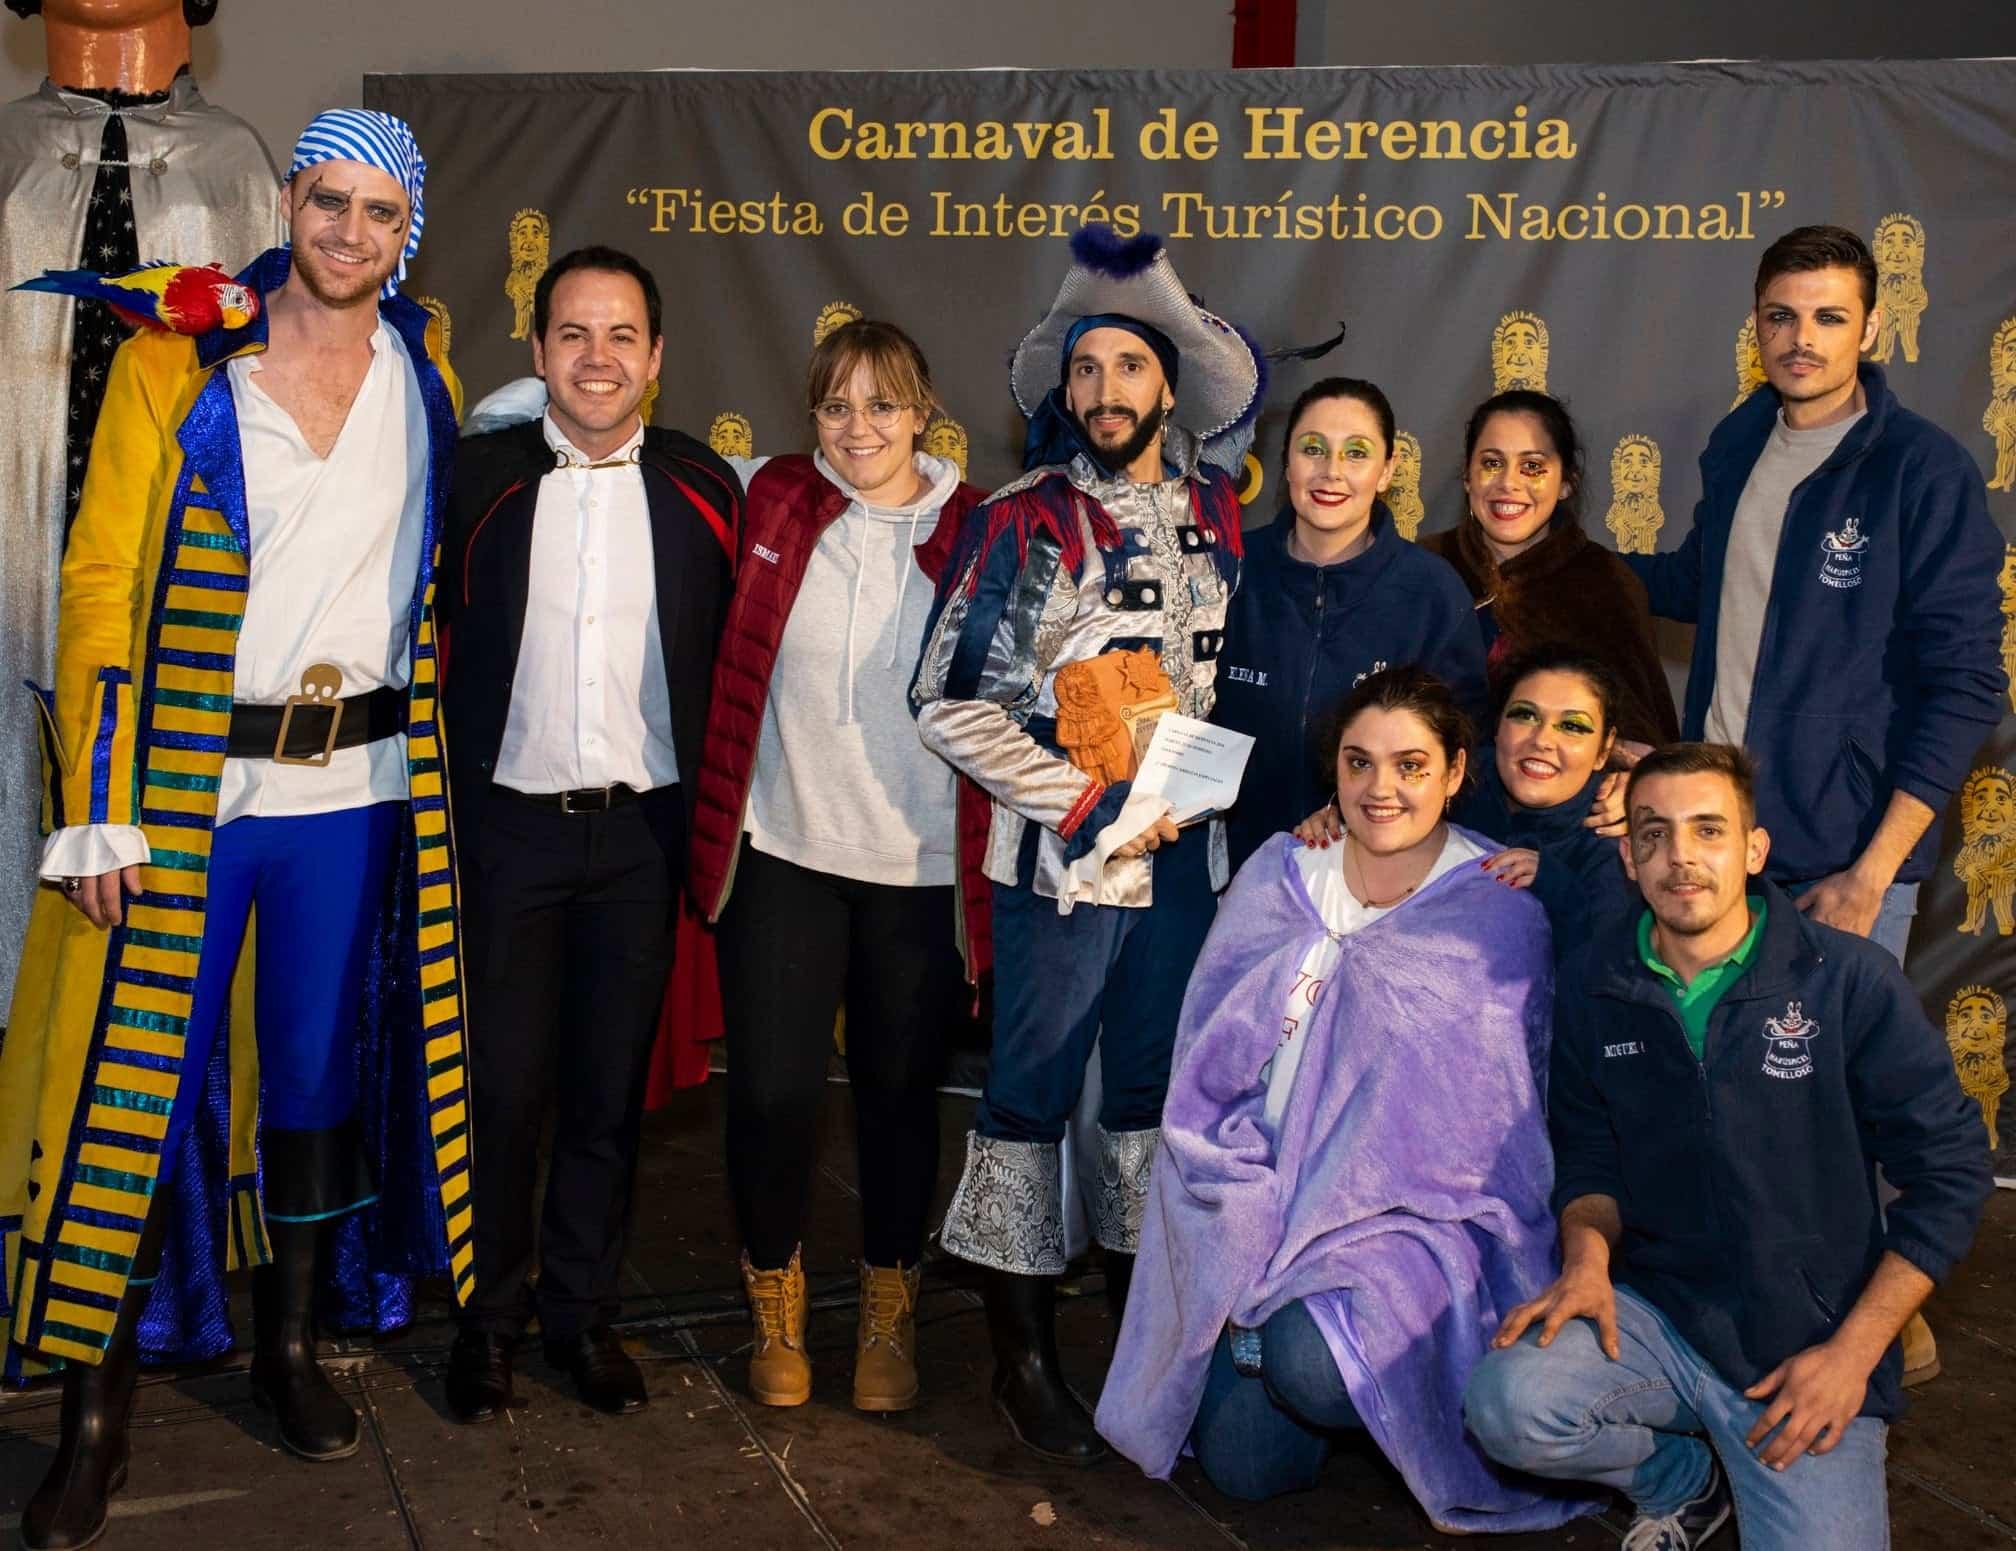 Carnaval de herencia 2020 ofertorio 157 - Selección de fotografías del Ofertorio del Carnaval de Herencia